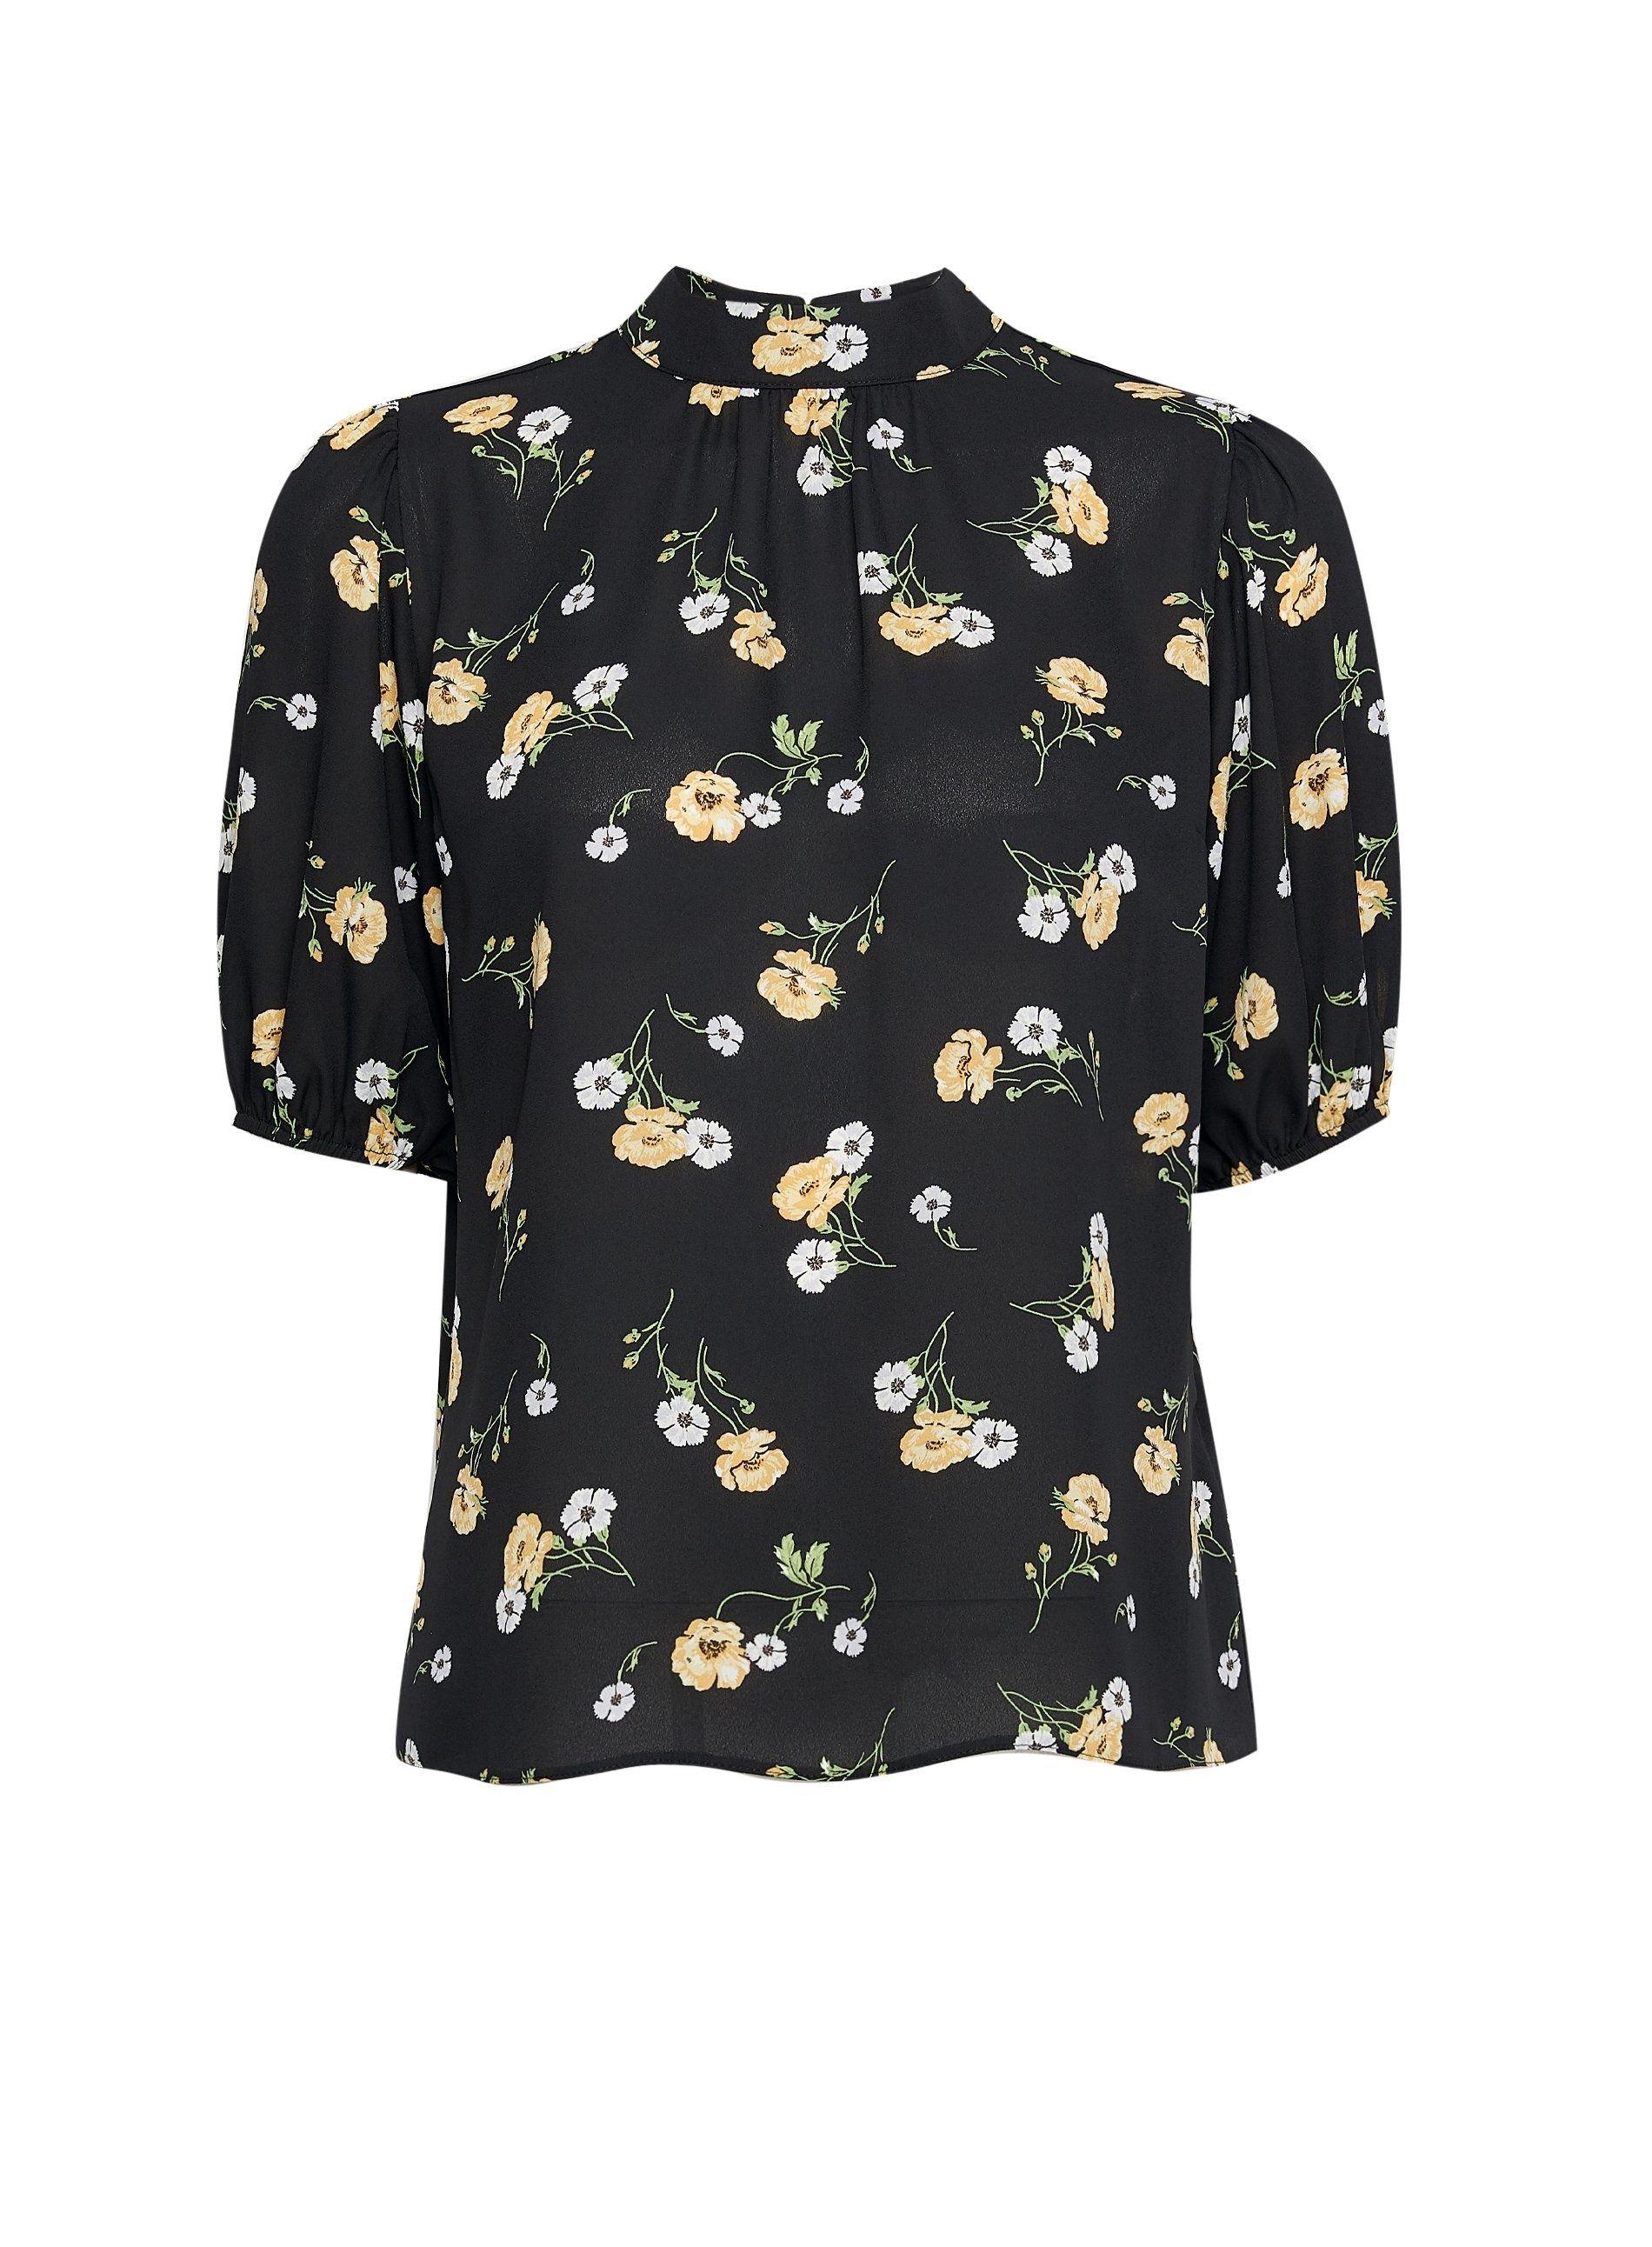 Dorothy Perkins Womens Petite Black Floral Top Turtleneck 3/4 Sleeve Blouse